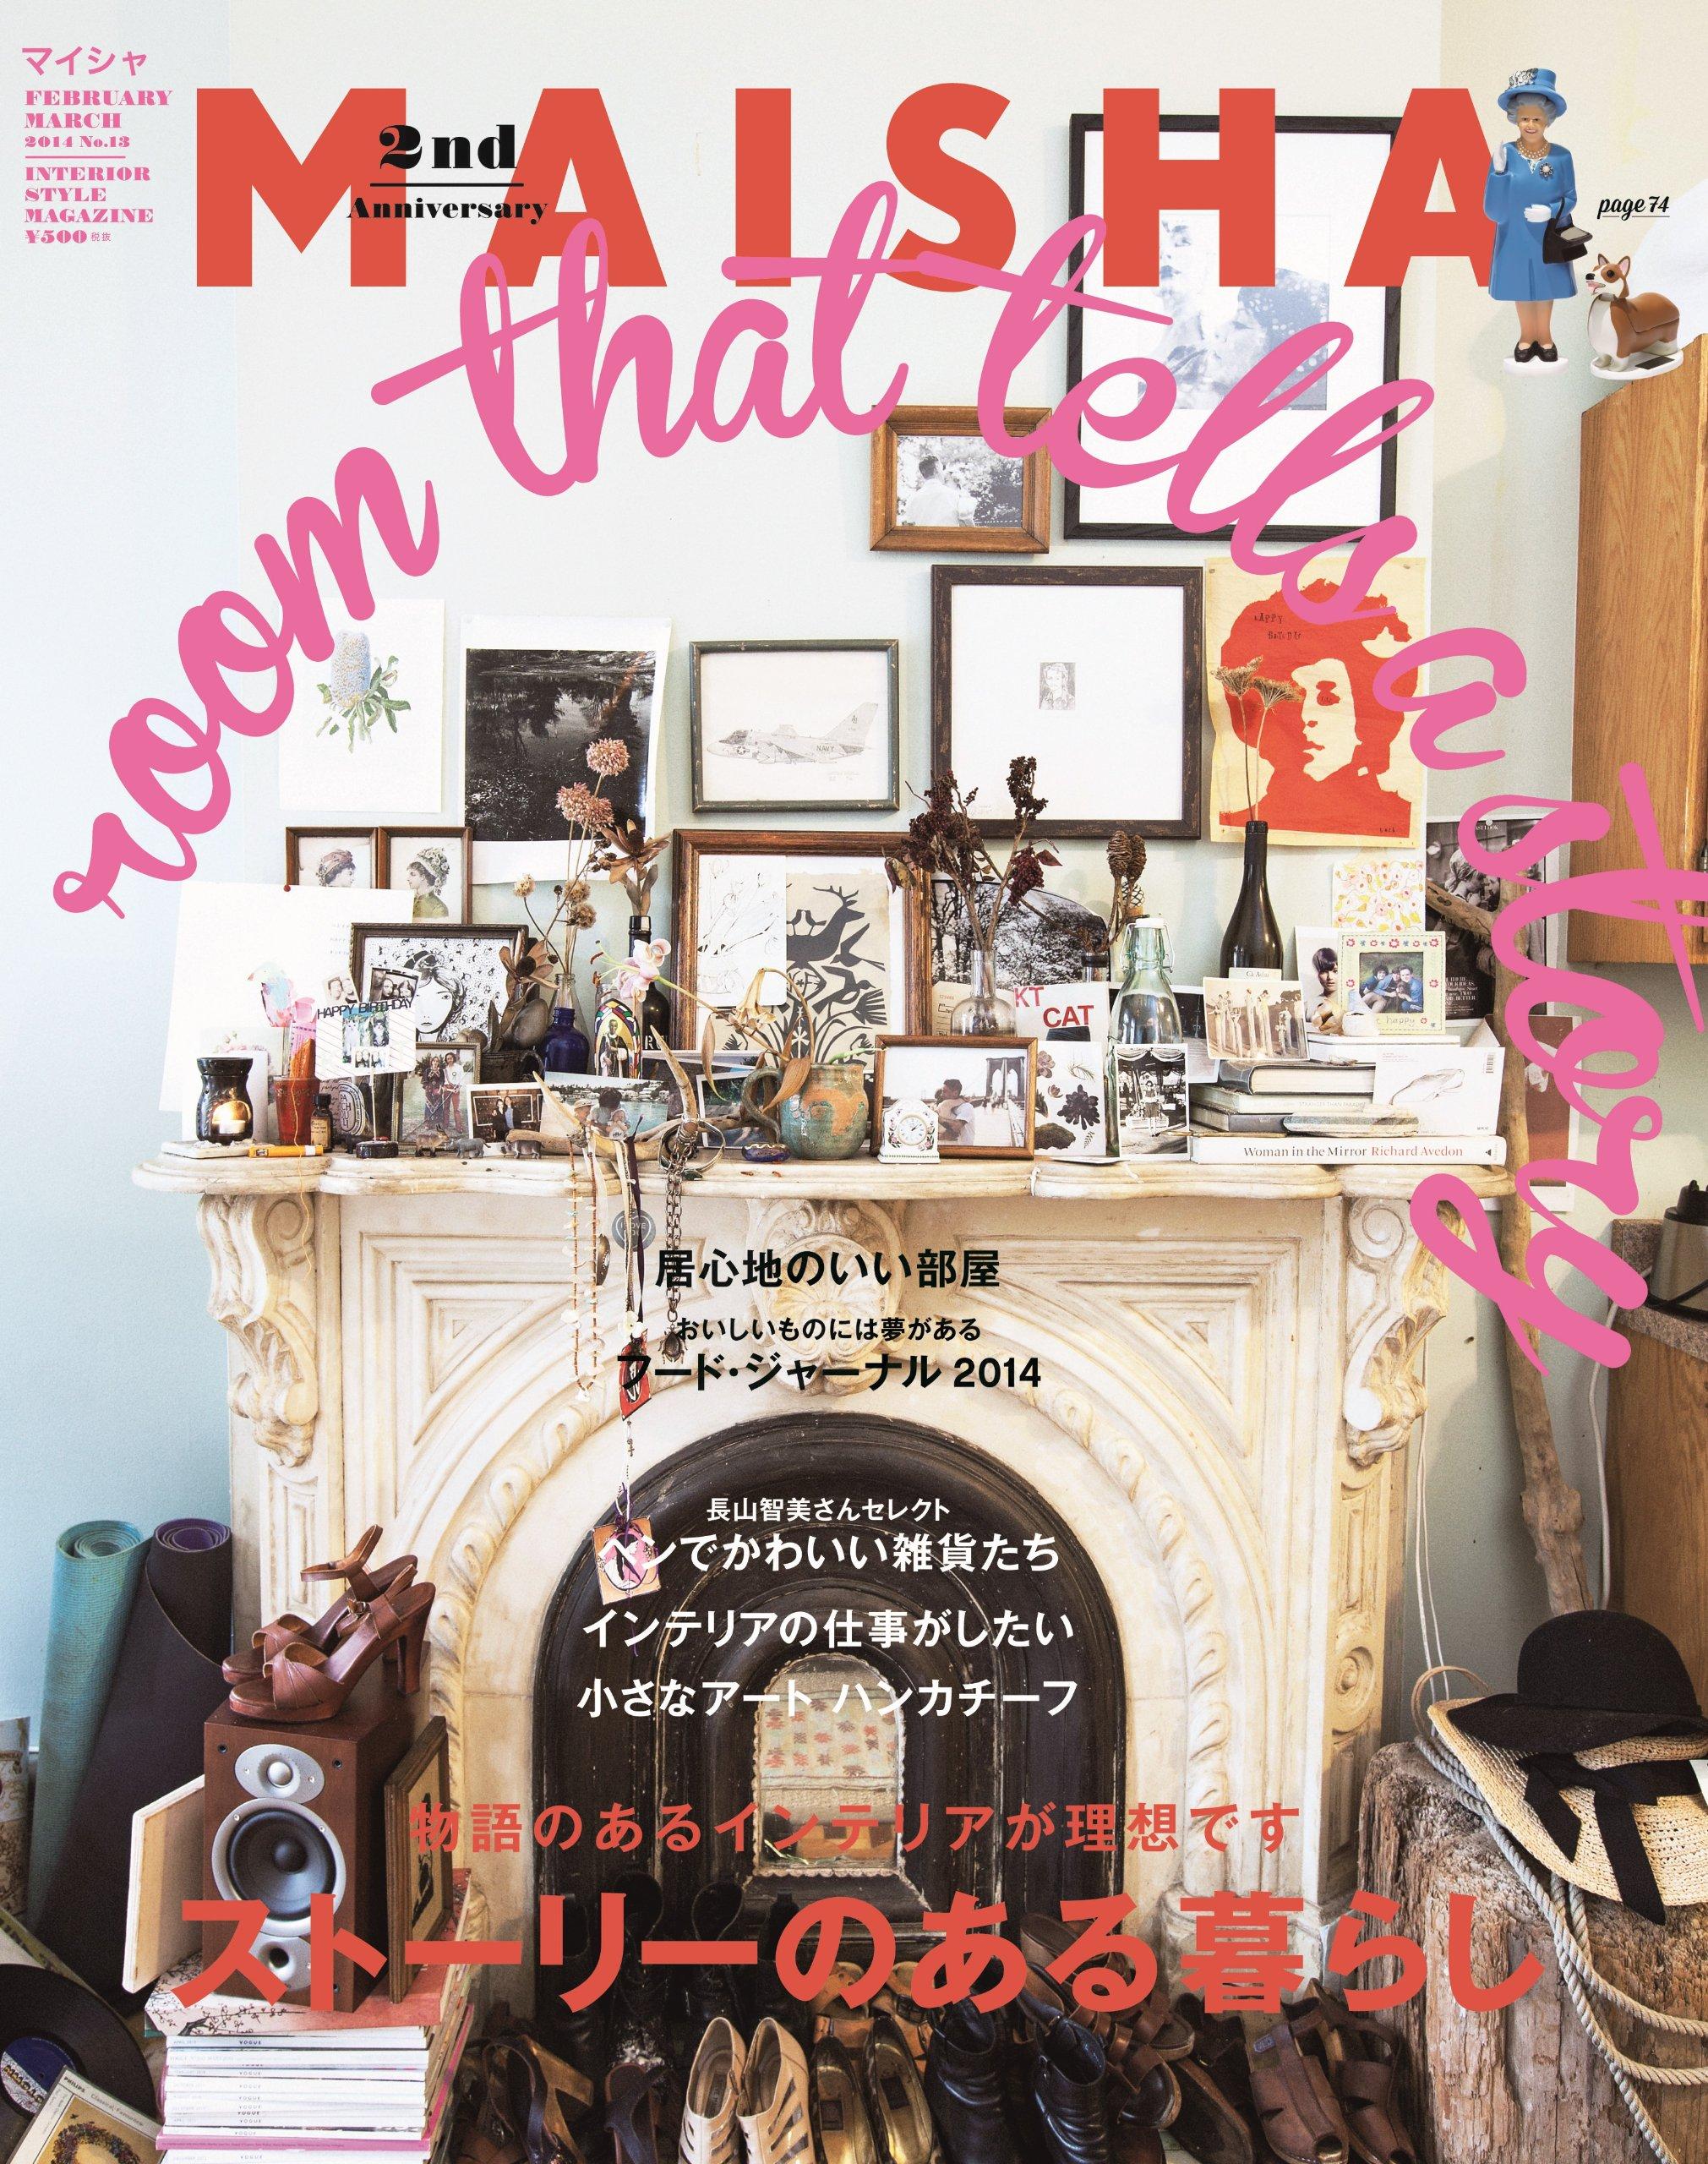 MAISHA No.13 ストーリーのある暮らし 出版社: 幻冬舎 (2014/1/25) 弊社の通販サイトが「MAISHA No.13」に掲載されました。